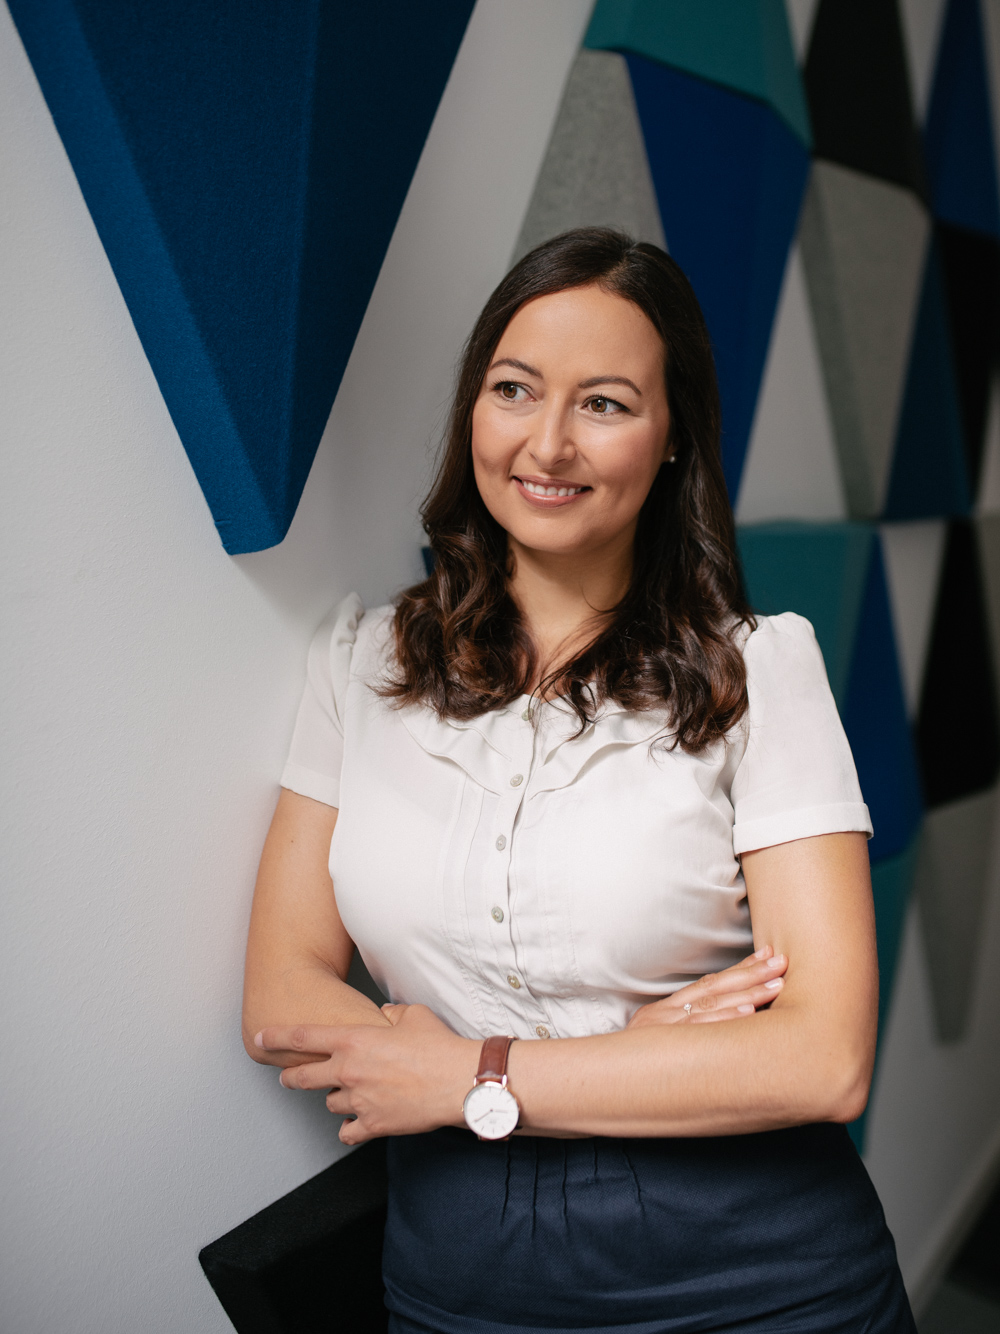 Louisa-Dominique Riedel